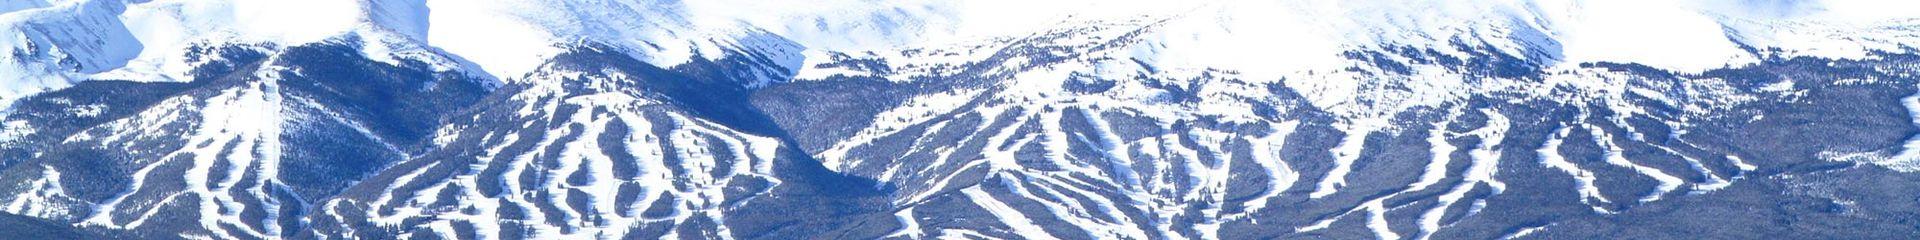 Top 6 Closest Ski Resorts Near Denver - UPDATED 2017/18